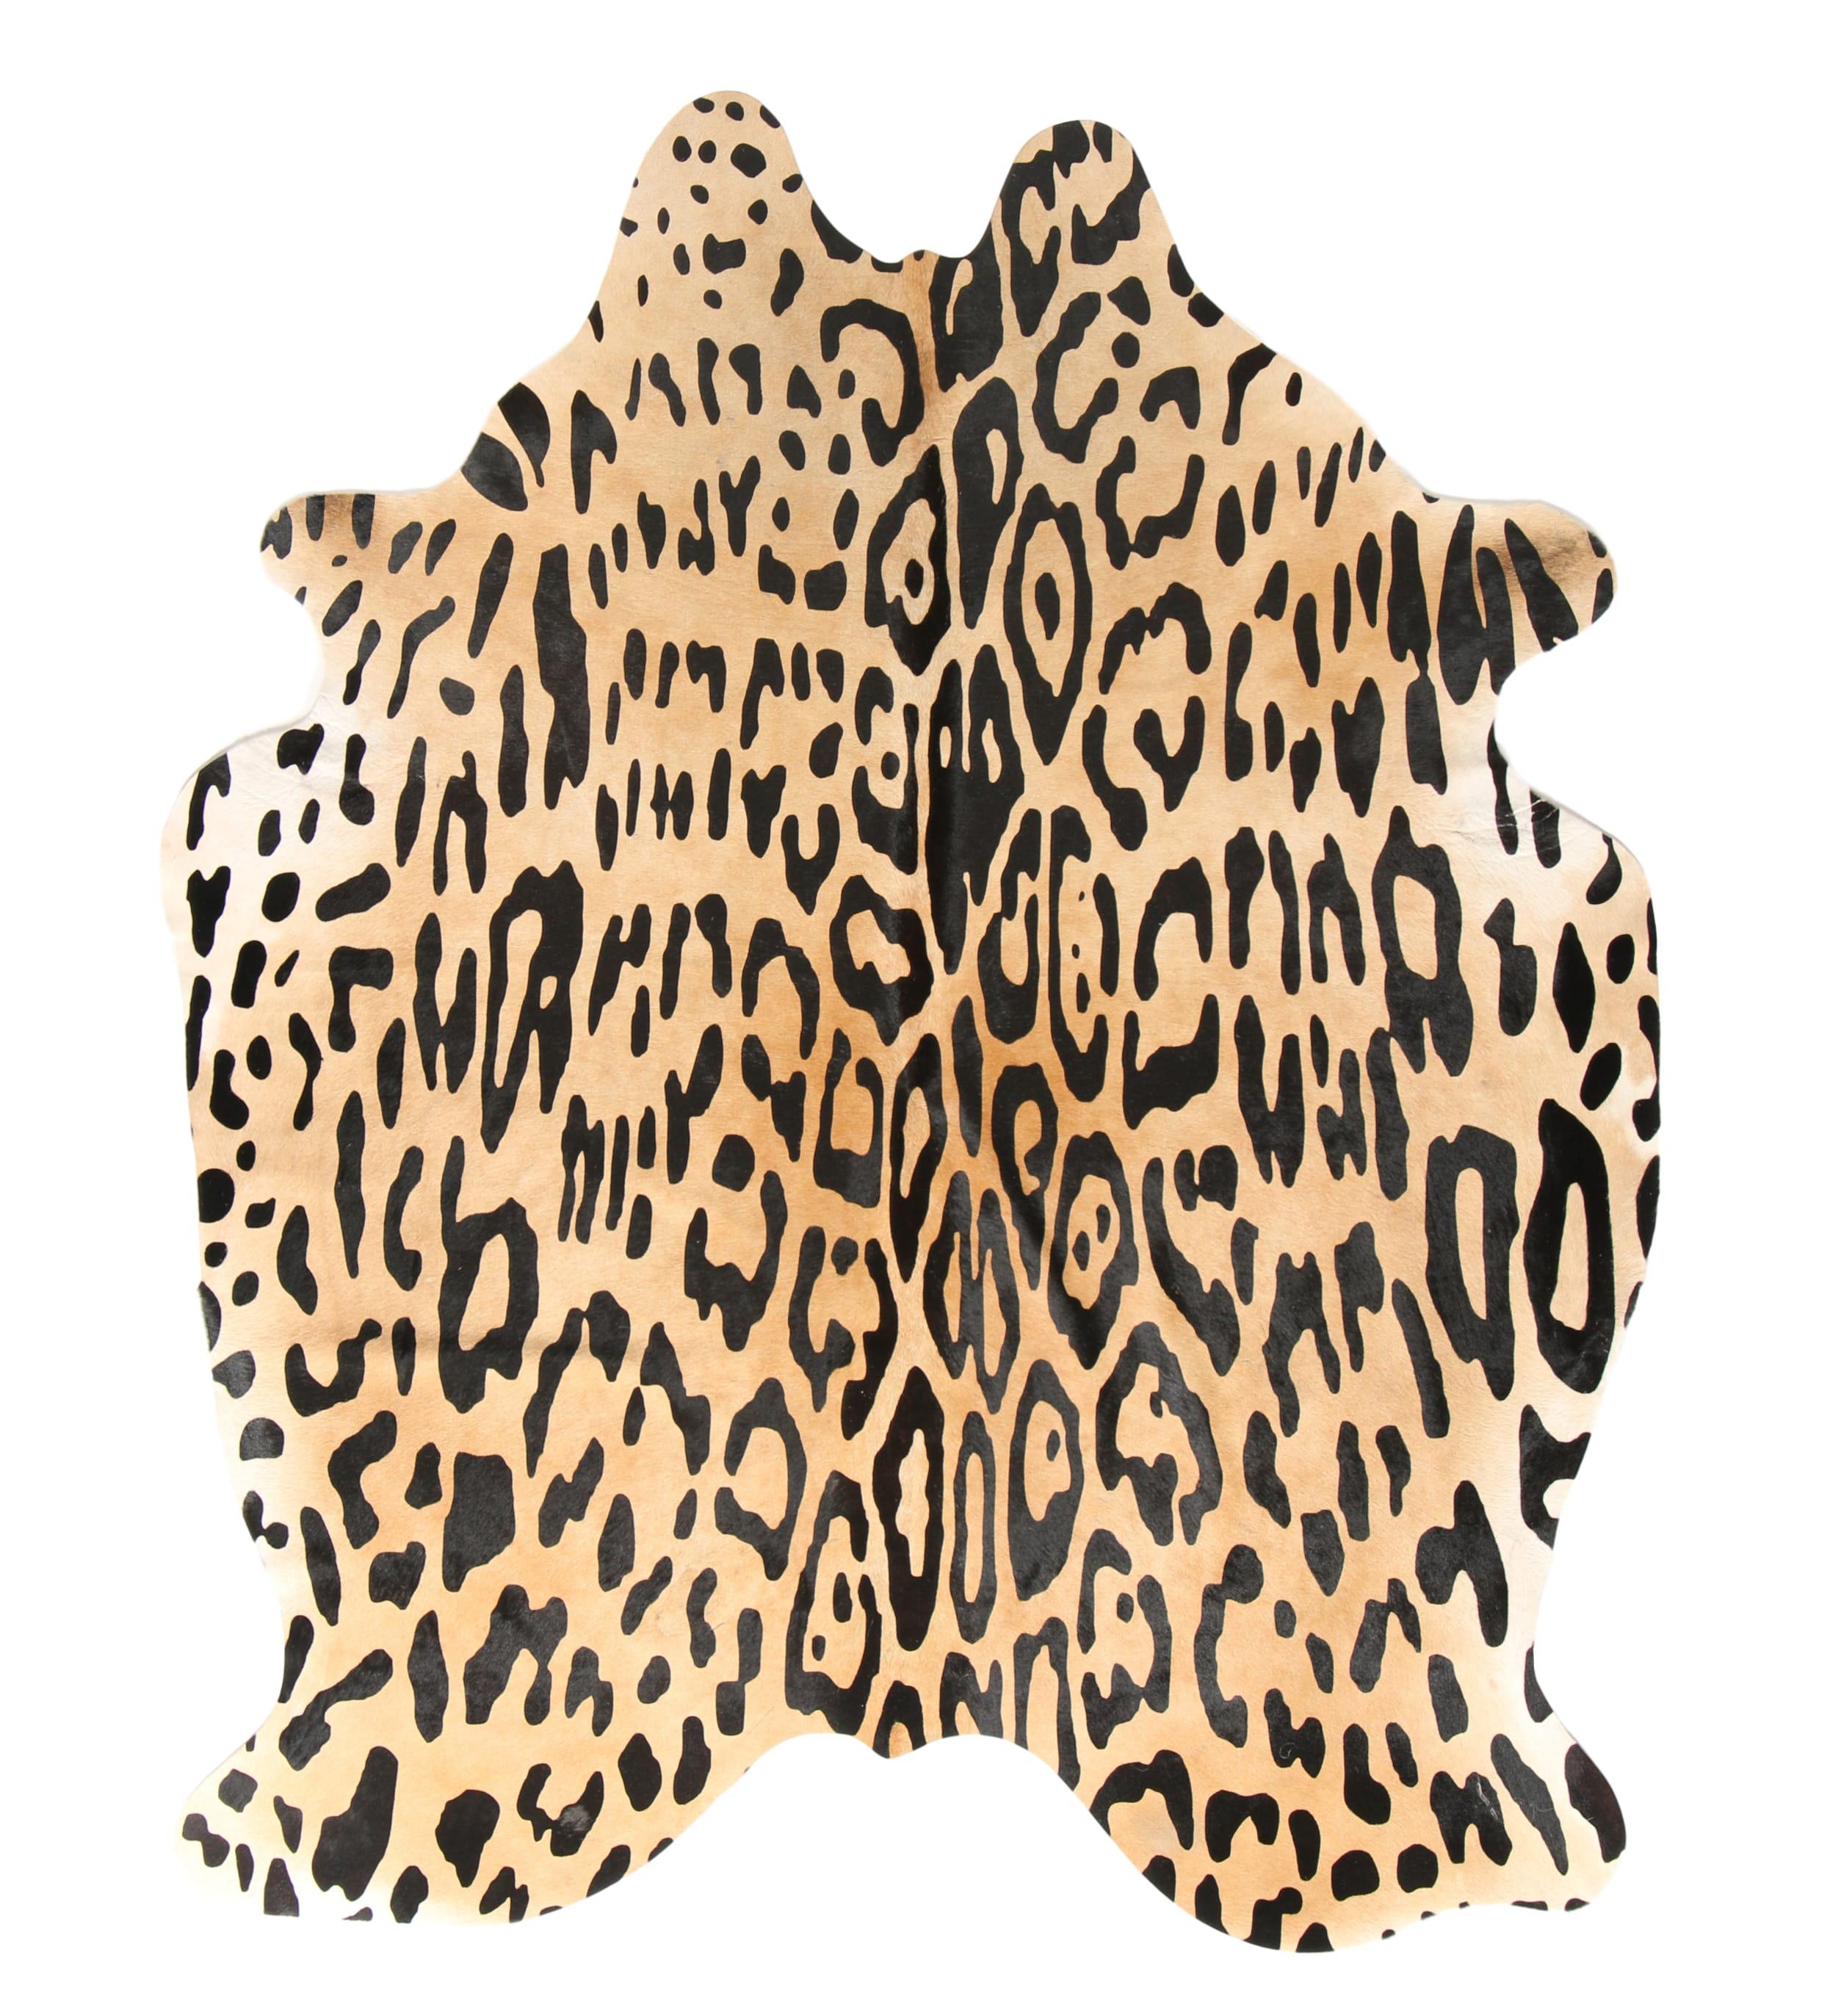 Tapis en peau de vache imprimé safari jaguar 180x200